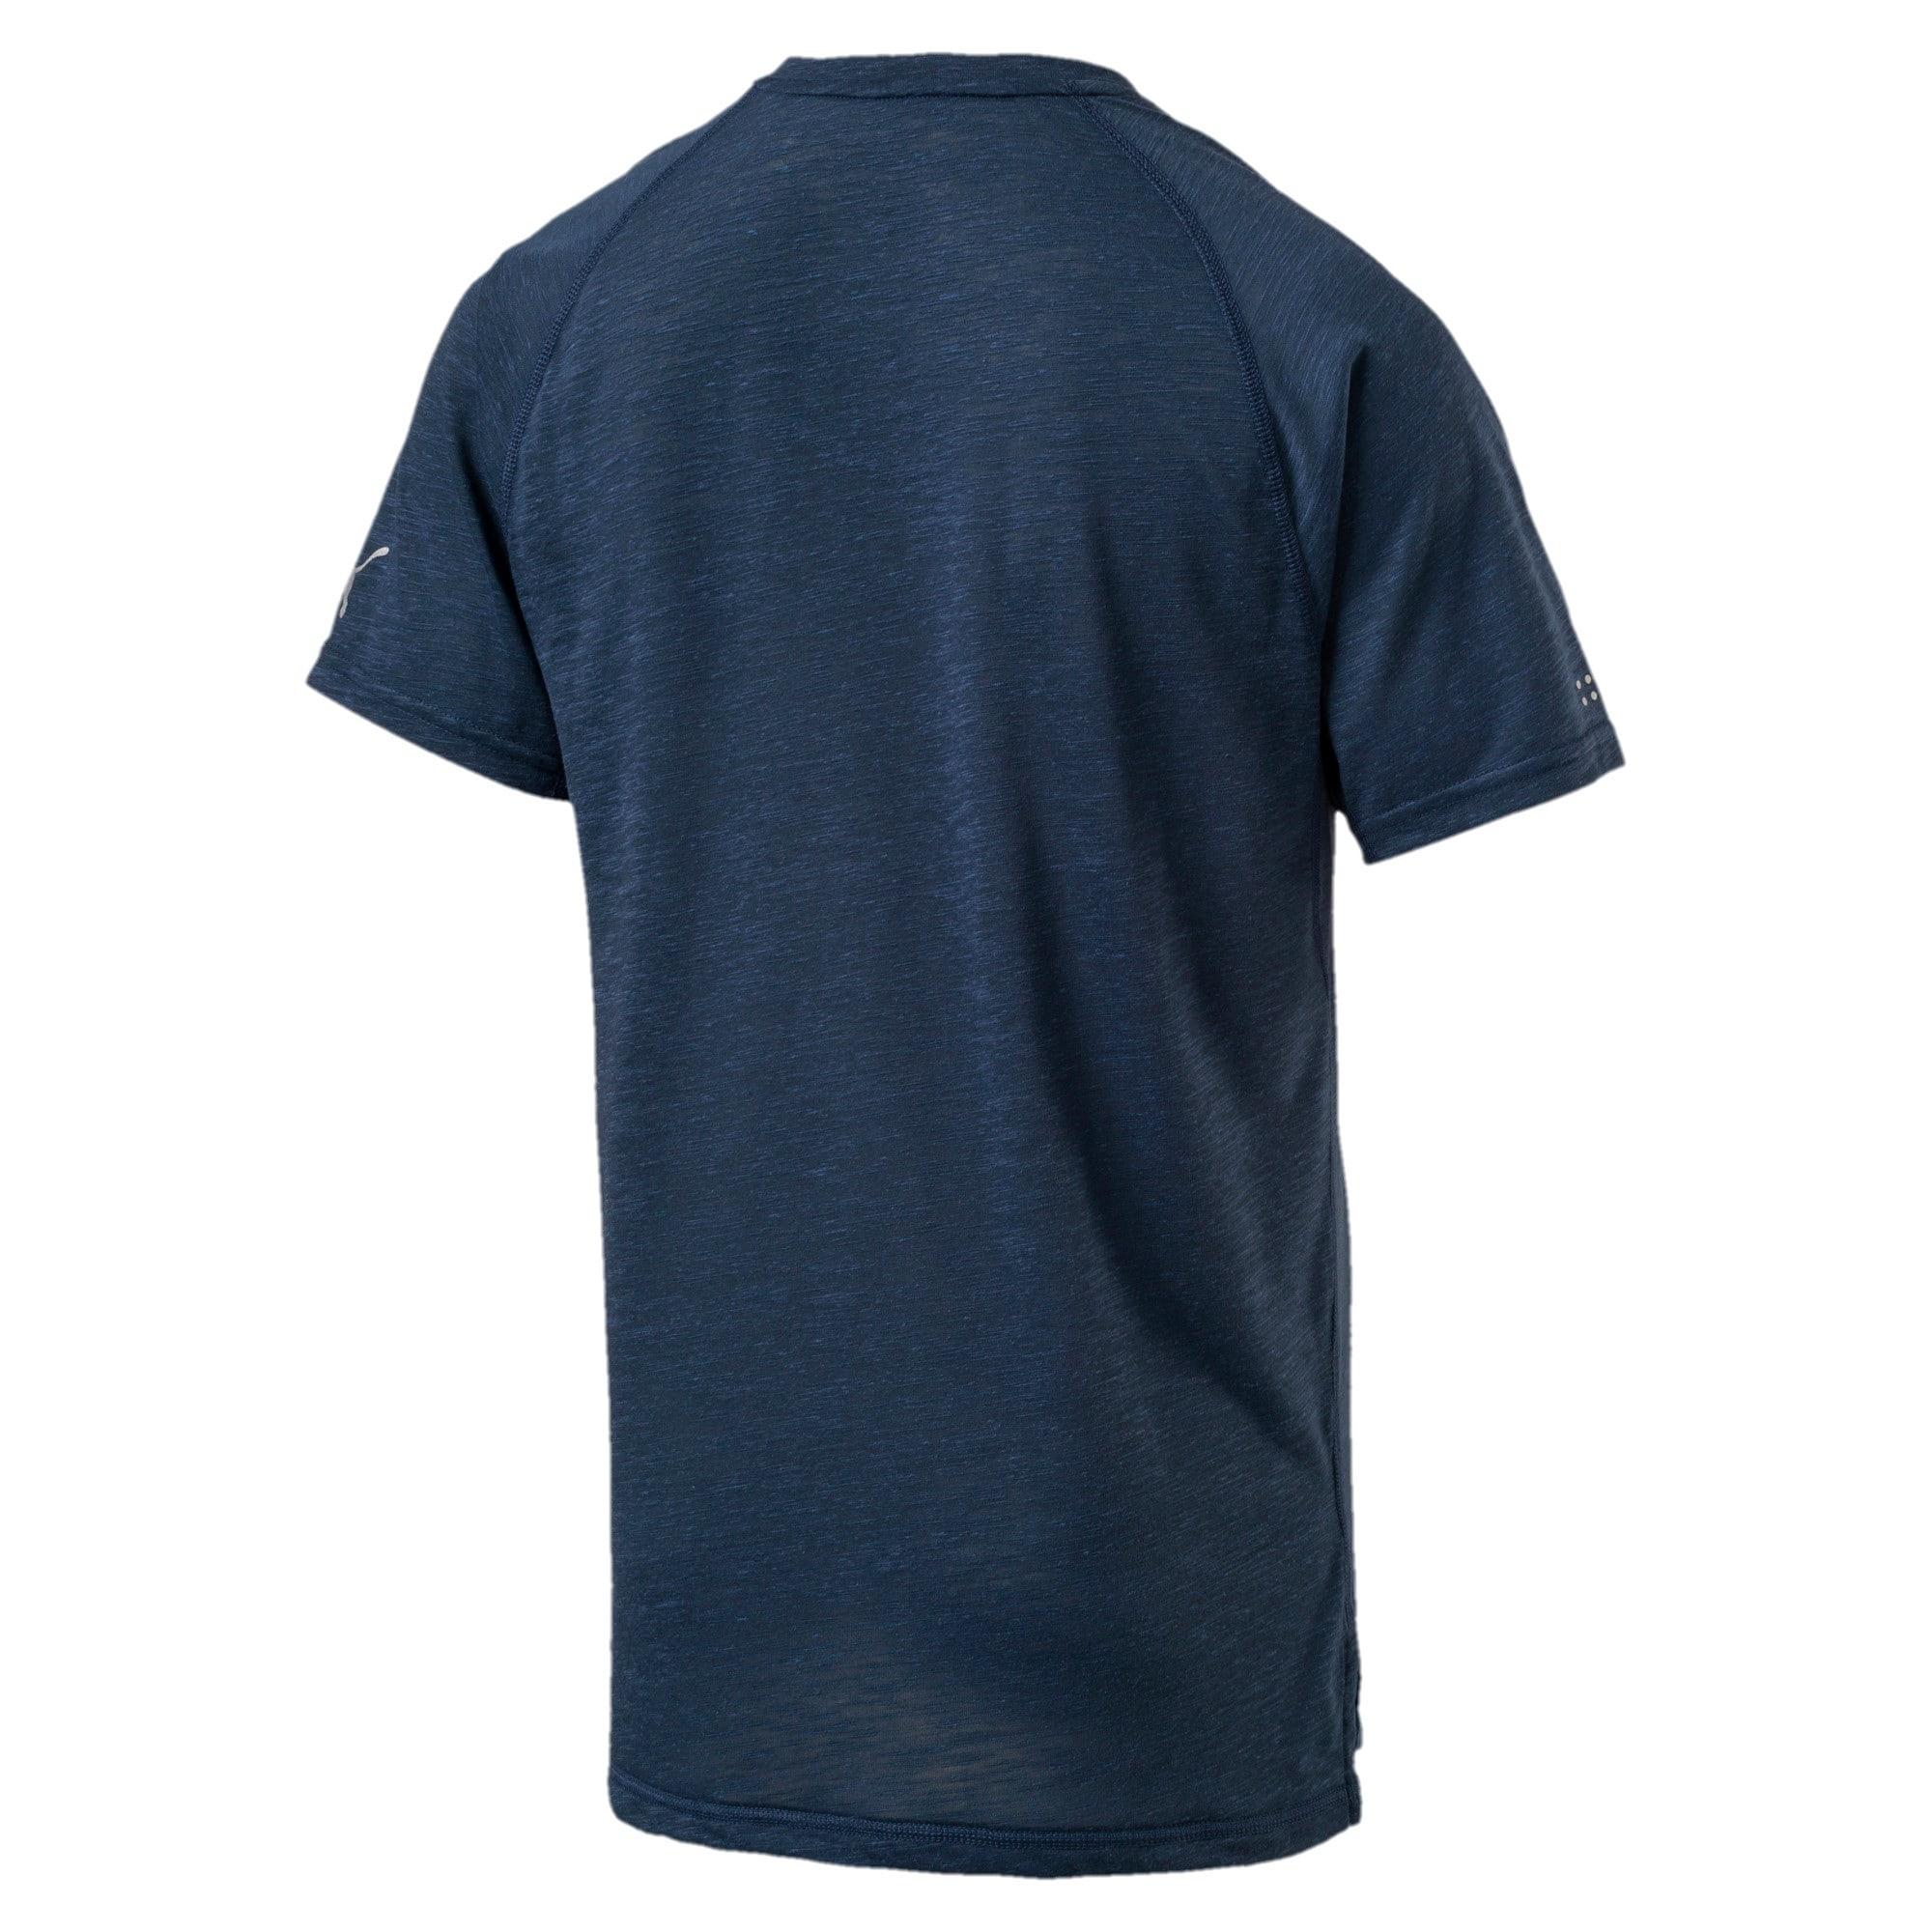 Thumbnail 4 of Energy Short Sleeve Men's Running T-Shirt, Sargasso Sea Heather, medium-IND